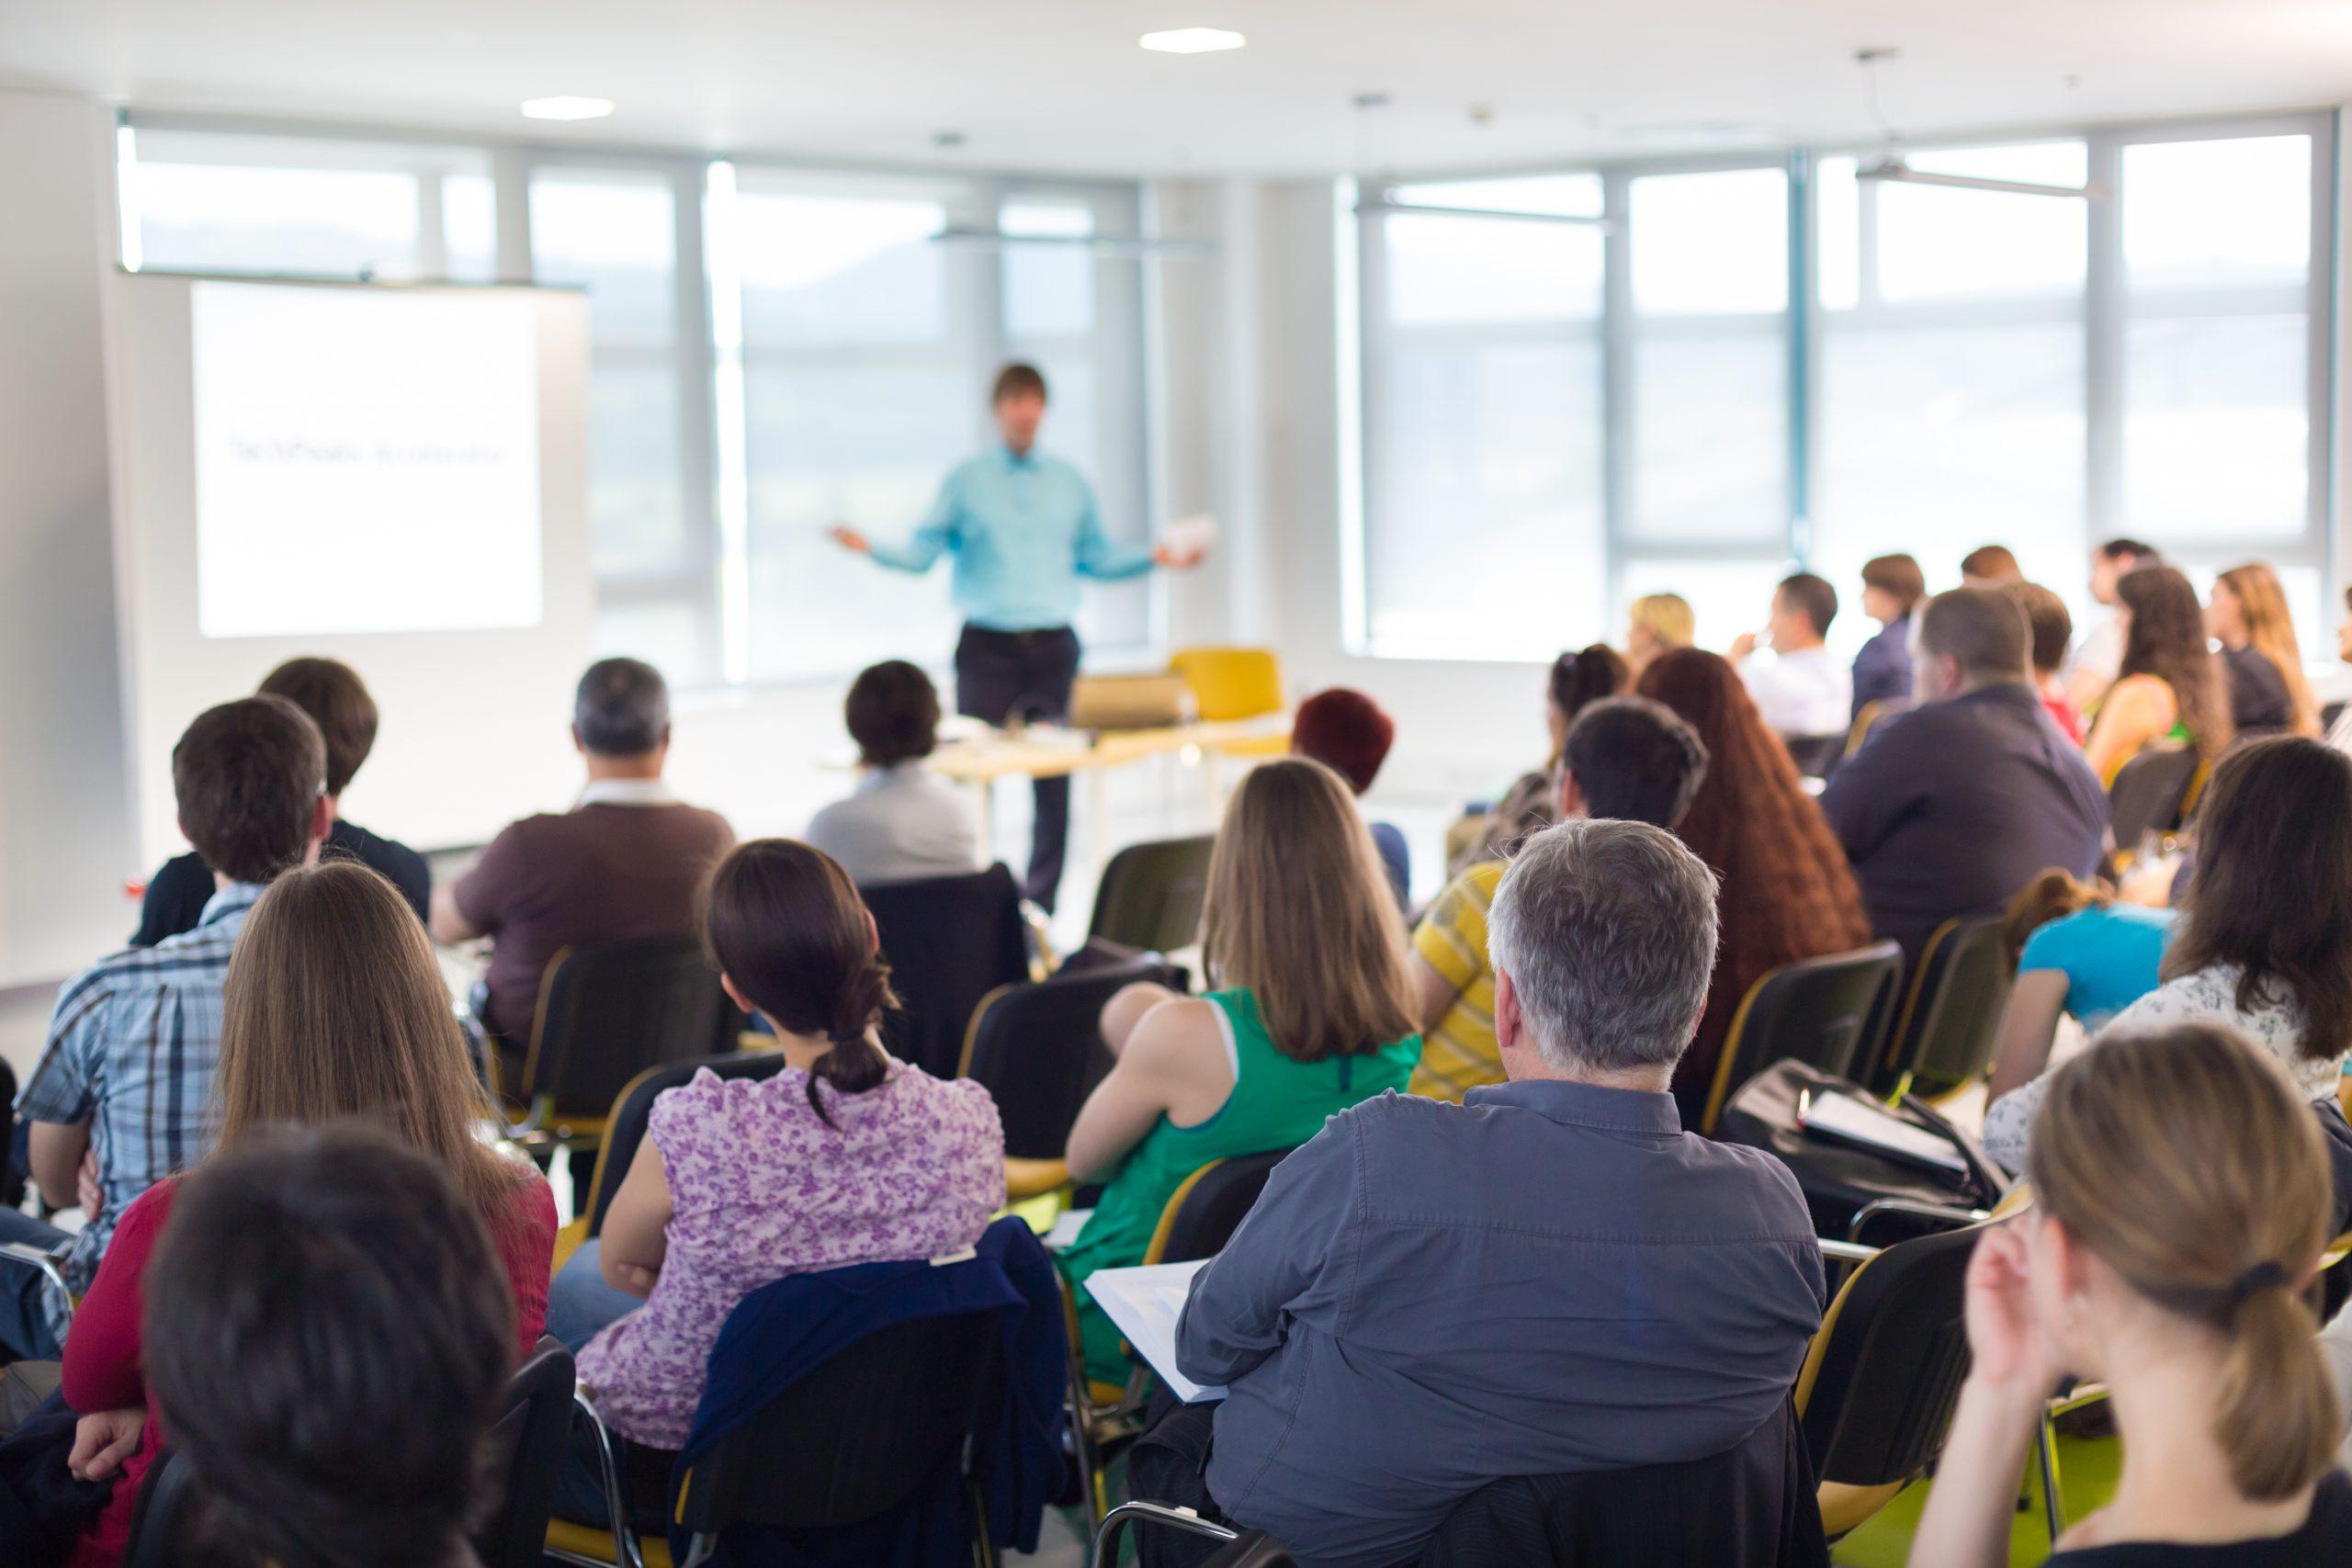 EADTrust foro electronico de accionistas electronic forum general meeting stakeholders